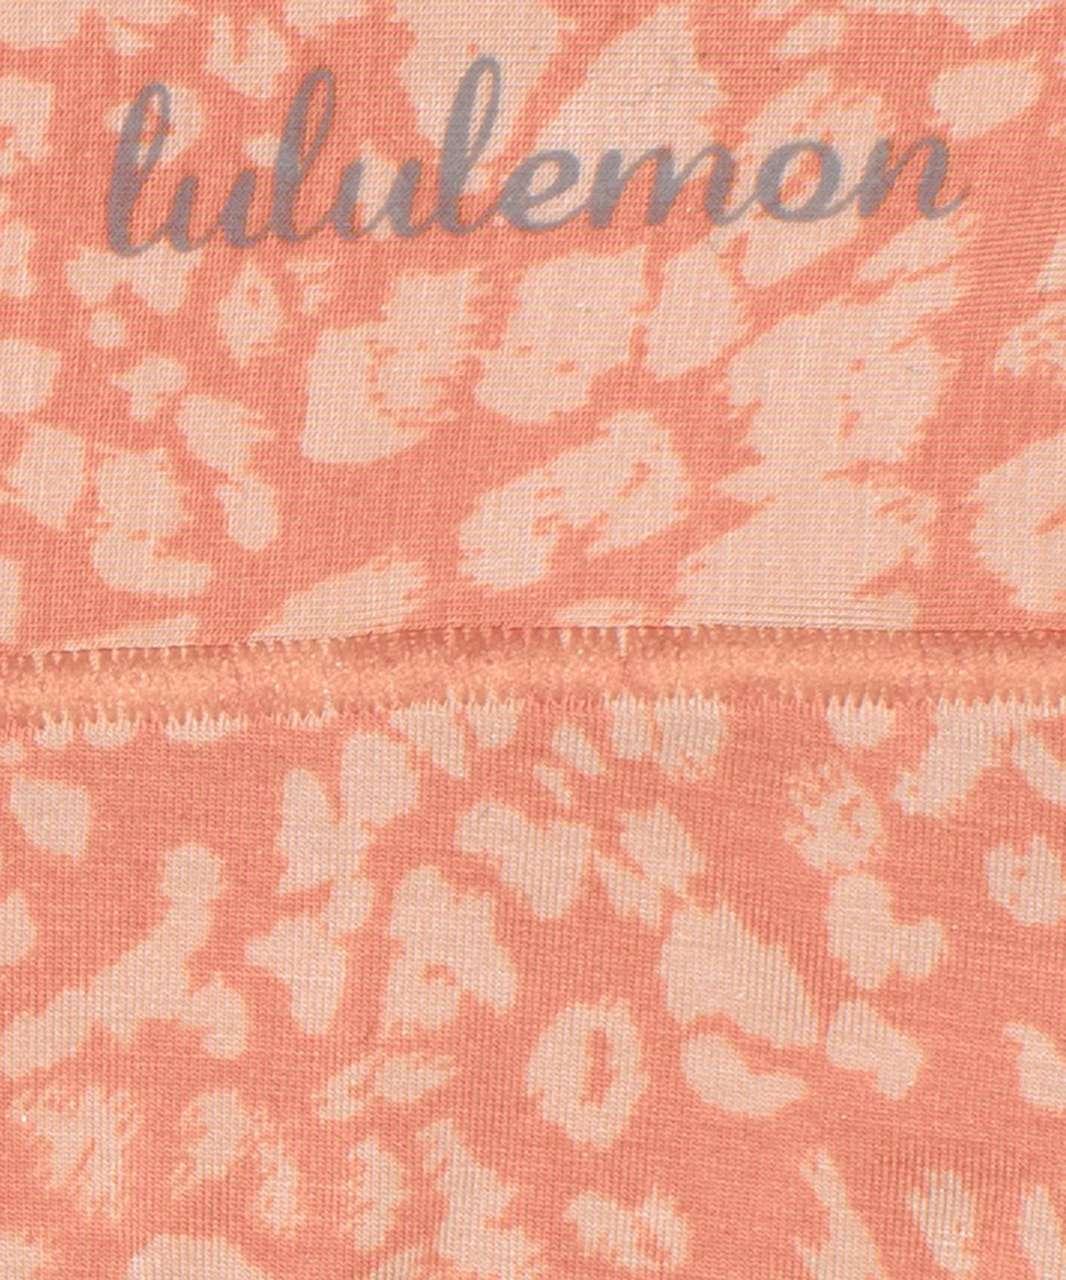 Lululemon Soft Breathable Bikini *3 Pack - Chrome / Spirited Savannah Misty Shell Pink Savannah / Misty Shell